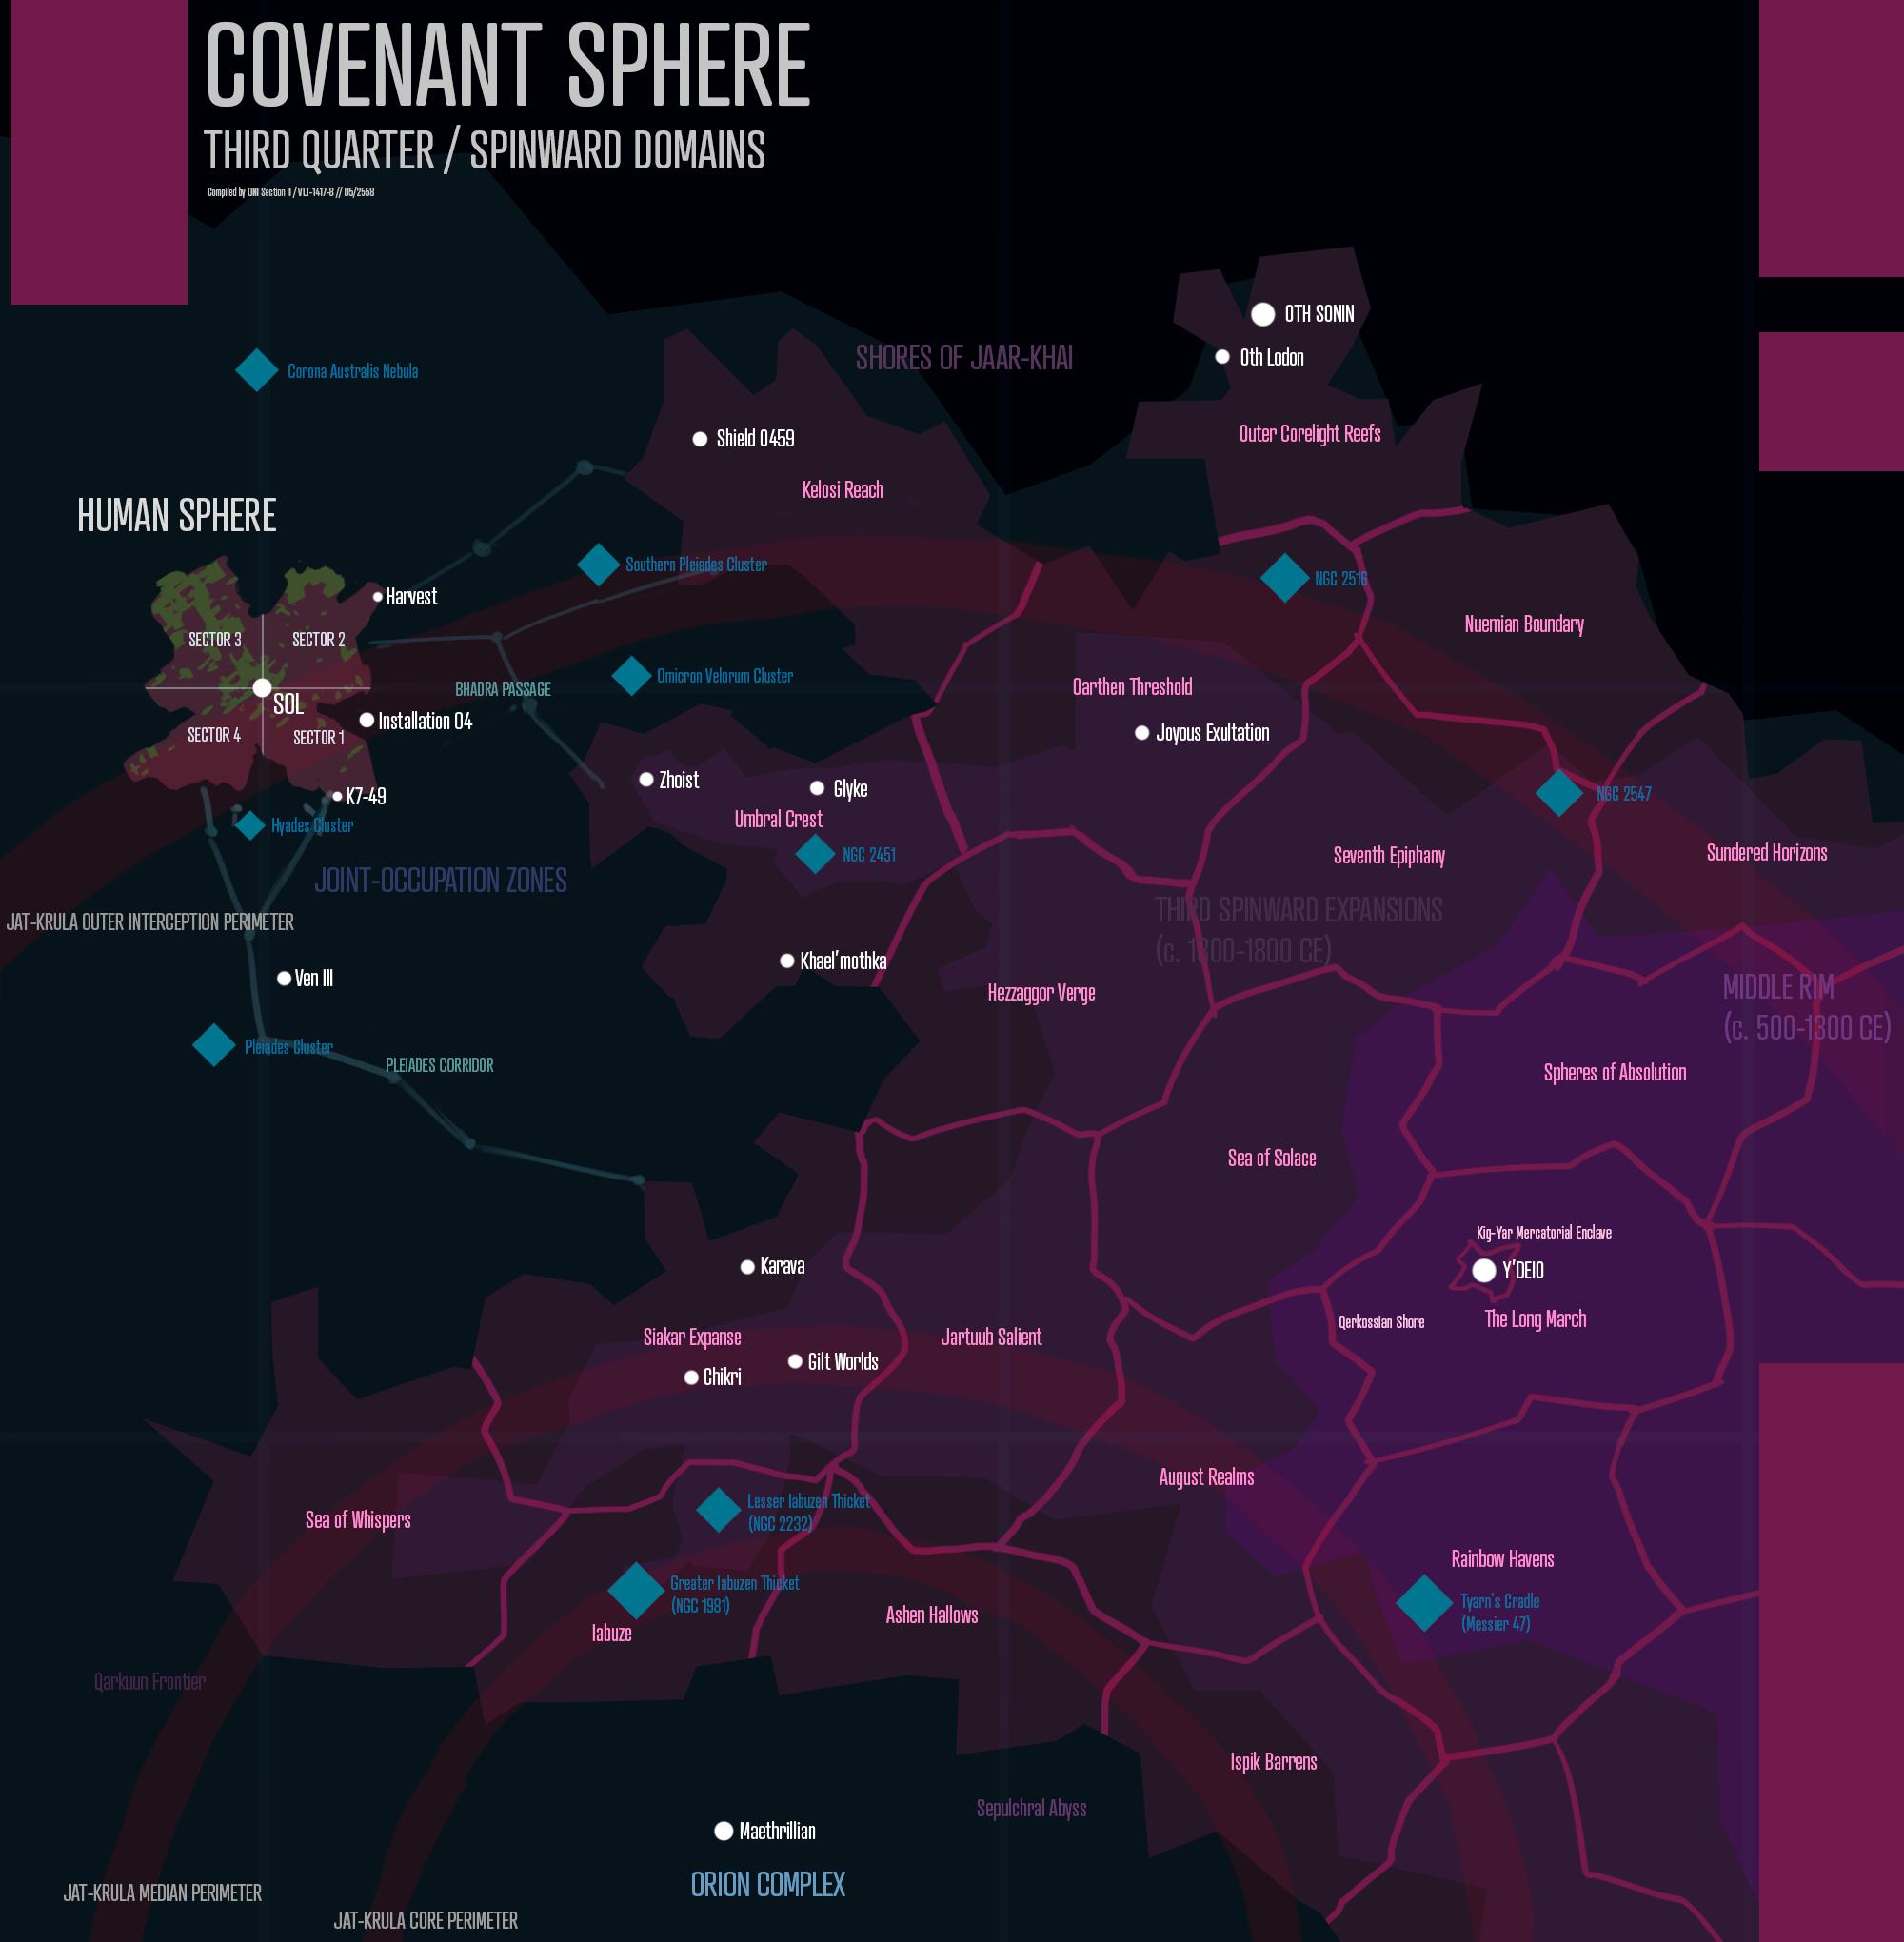 https://orig00.deviantart.net/cc31/f/2018/296/1/6/siakar_expanse_context_map_wip3_by_the_chronothaur-dcq5gpp.png